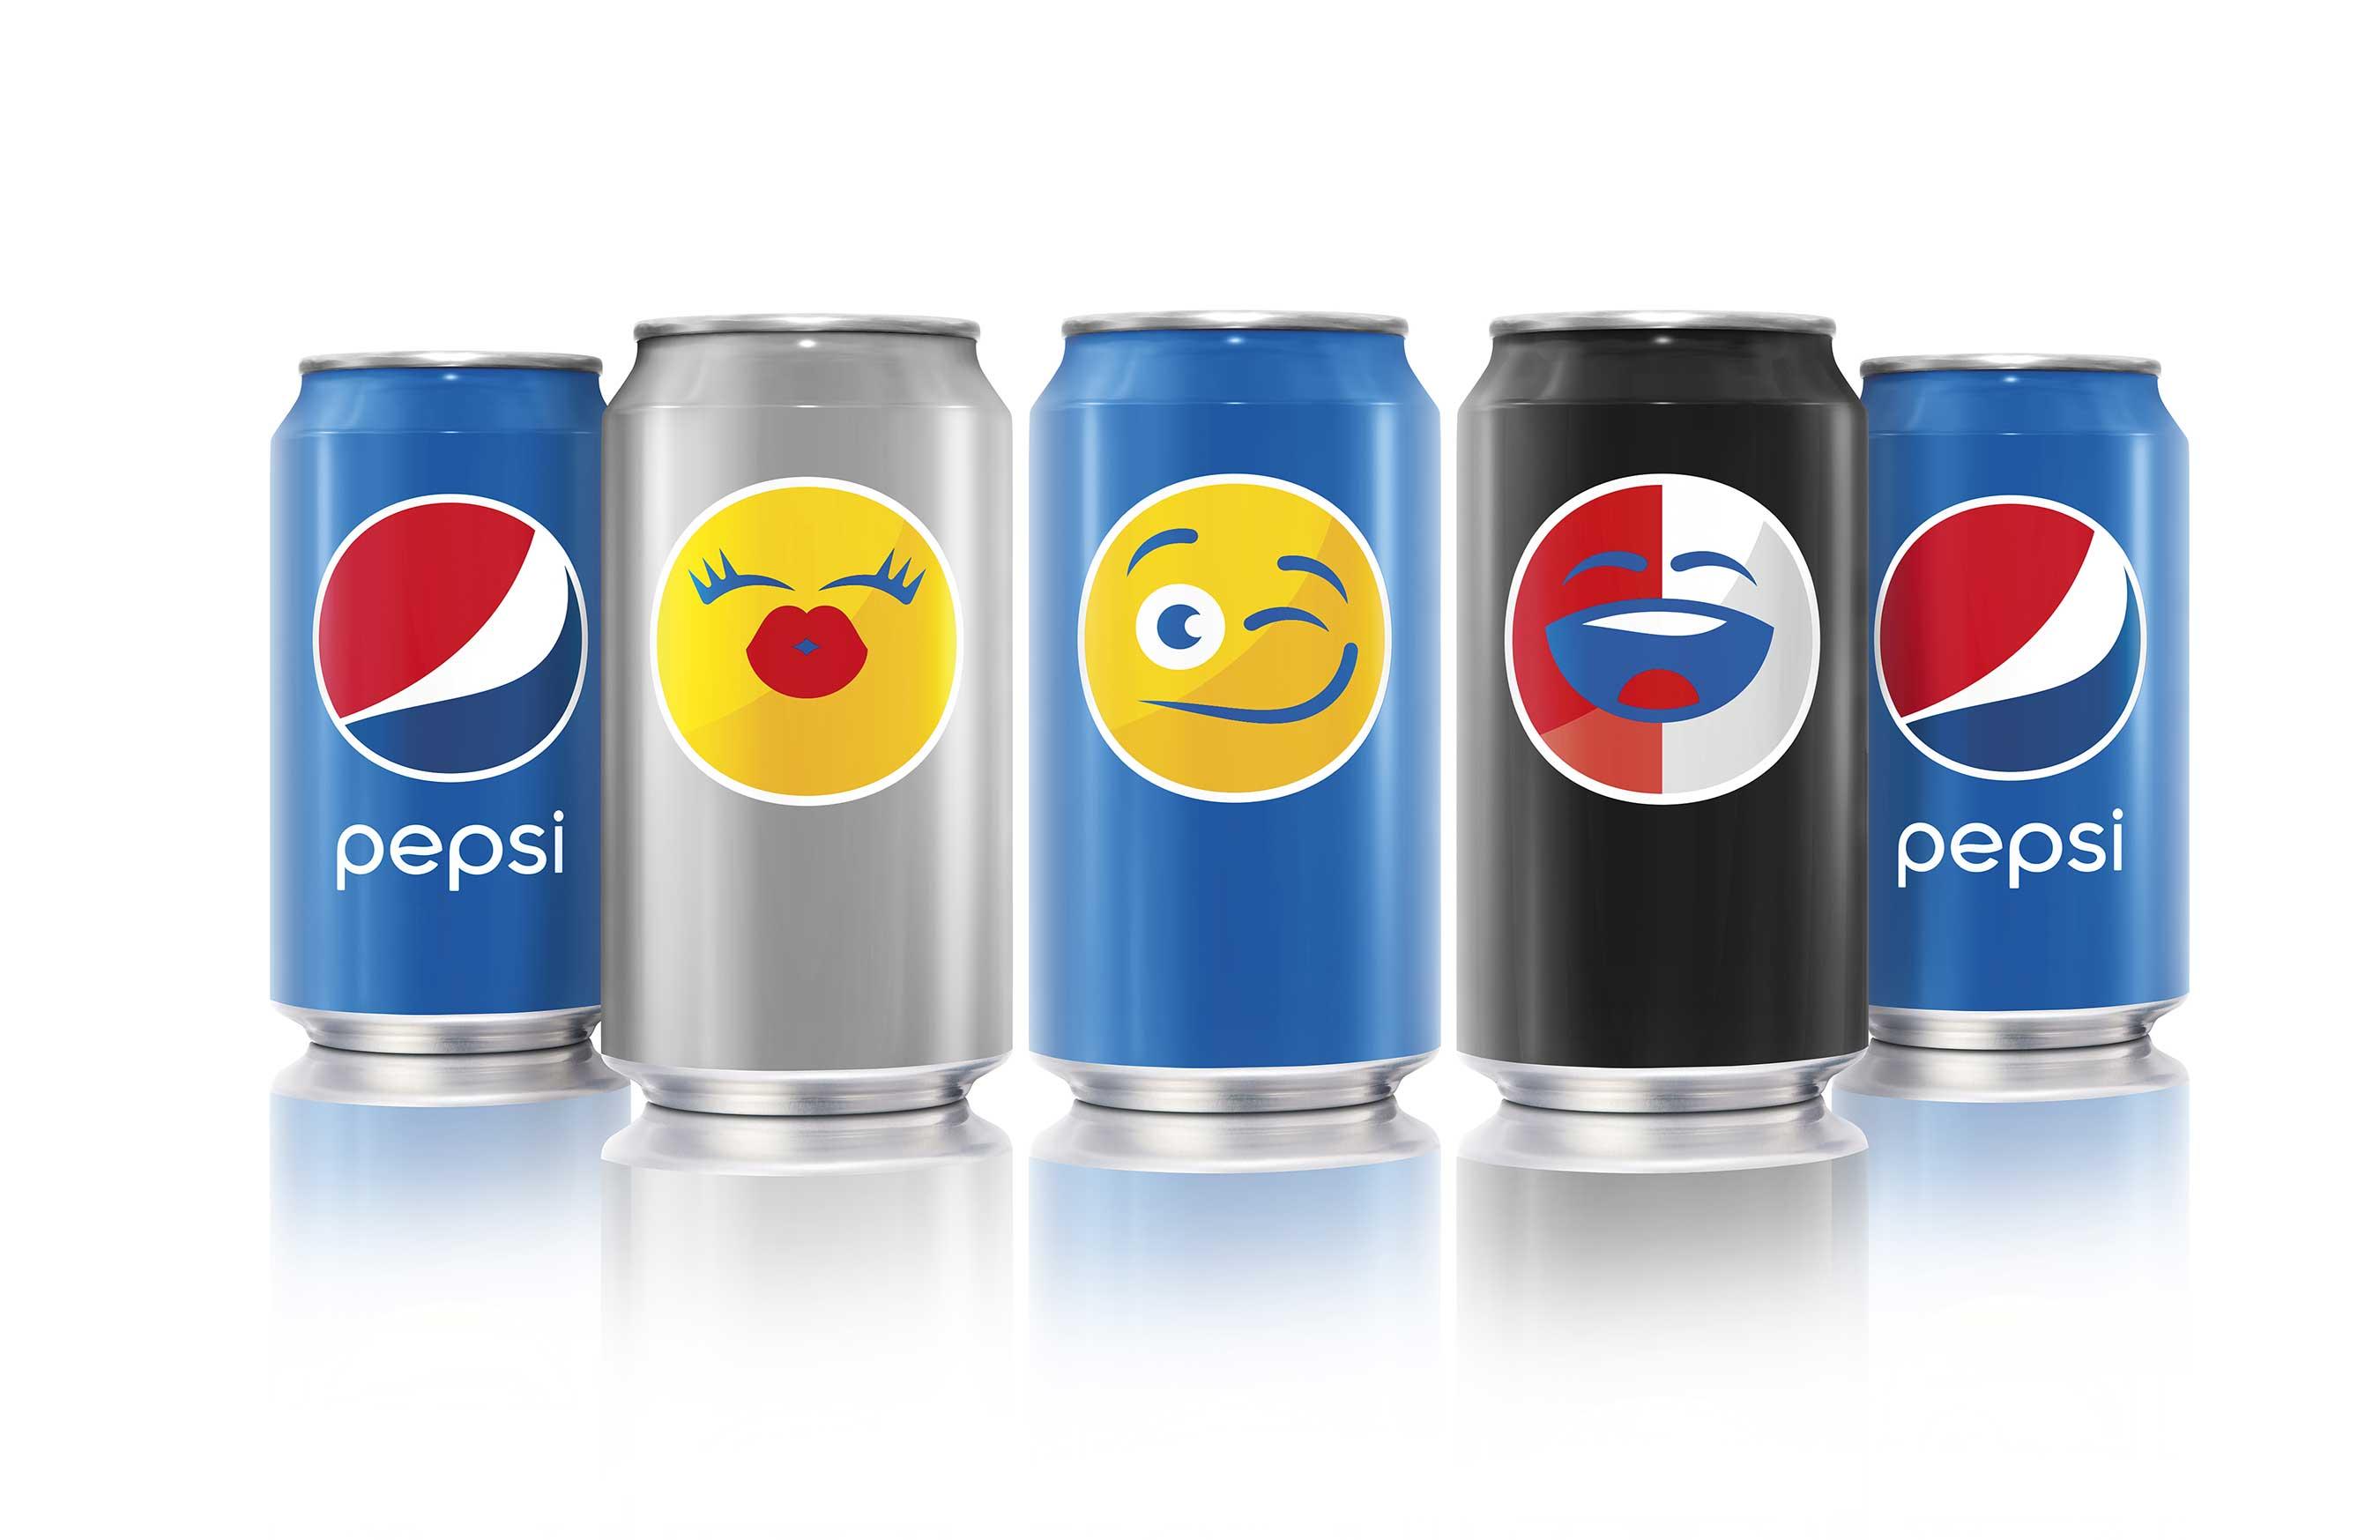 PepsiMoji em toda a marca – Pepsi Diet Light, Pepsi, Pepsi MAX 207cc3975e